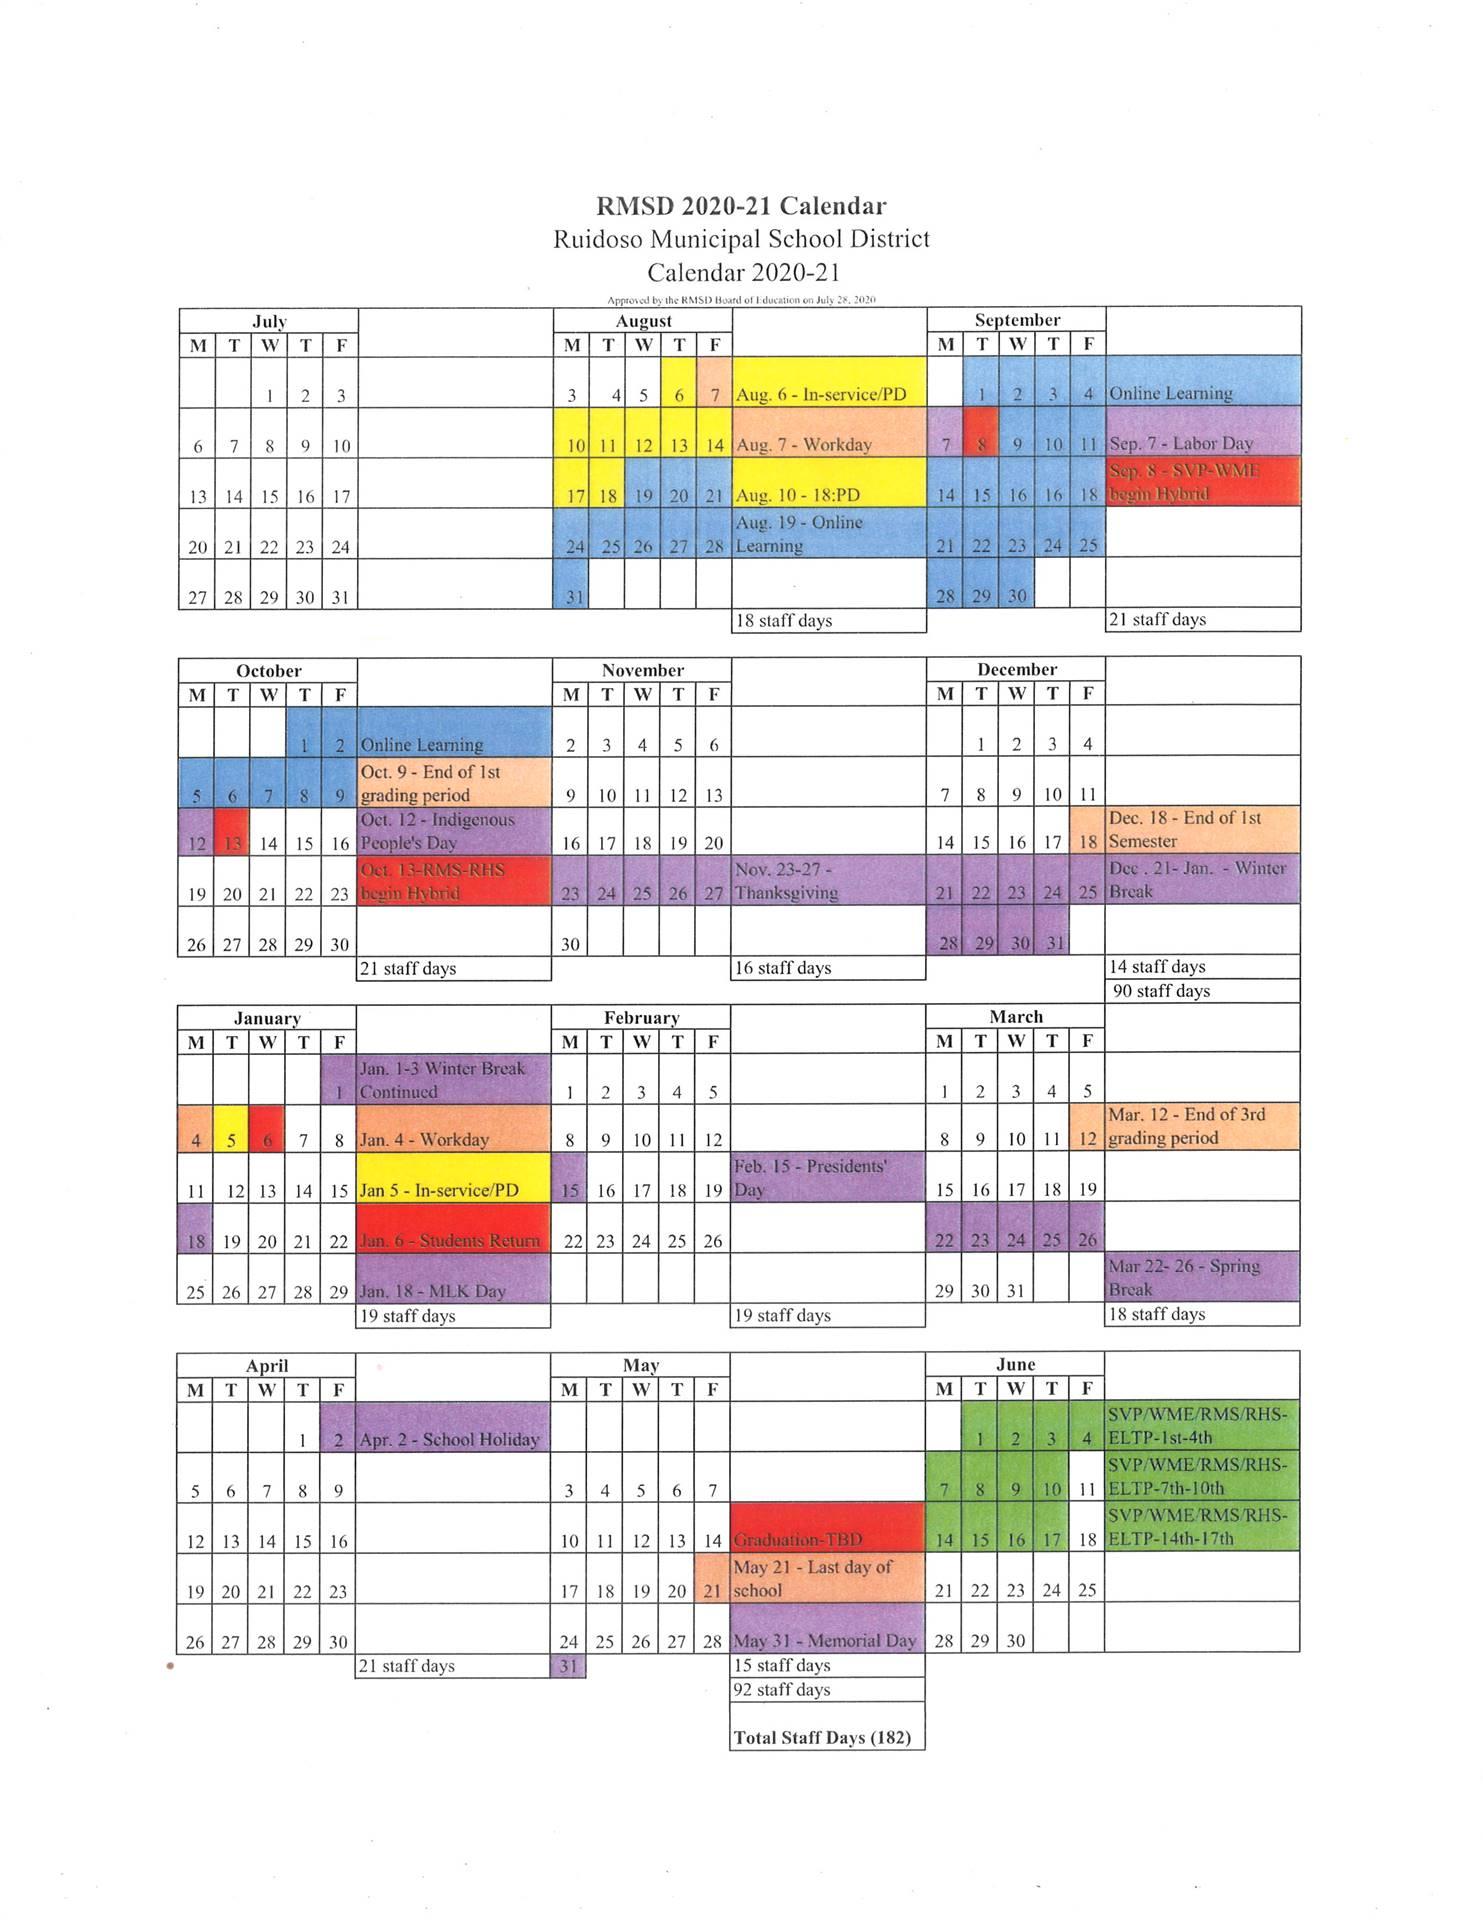 2020-21 RMSD Calendar